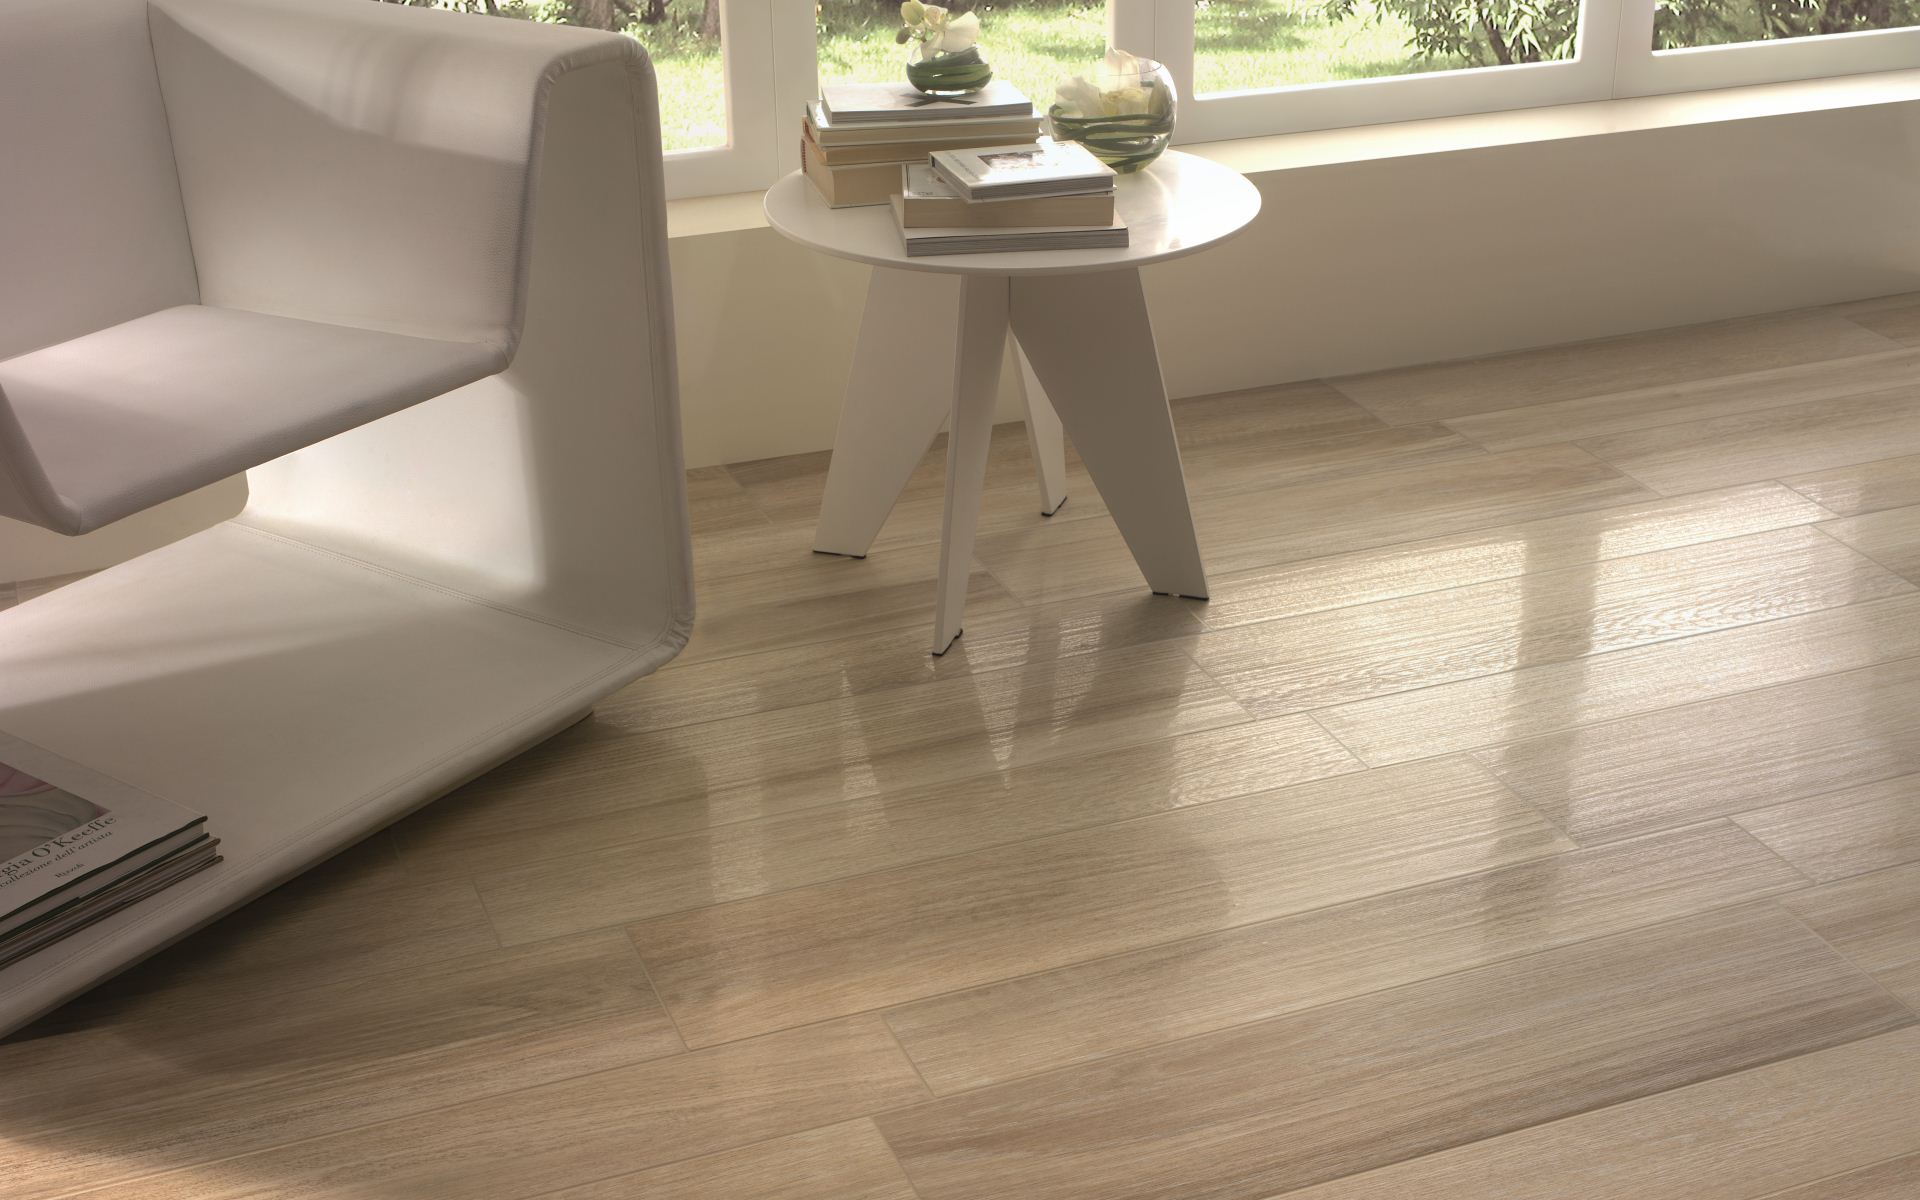 mywood-beige-13x80-20x80-lappato-cpy-2.jpg